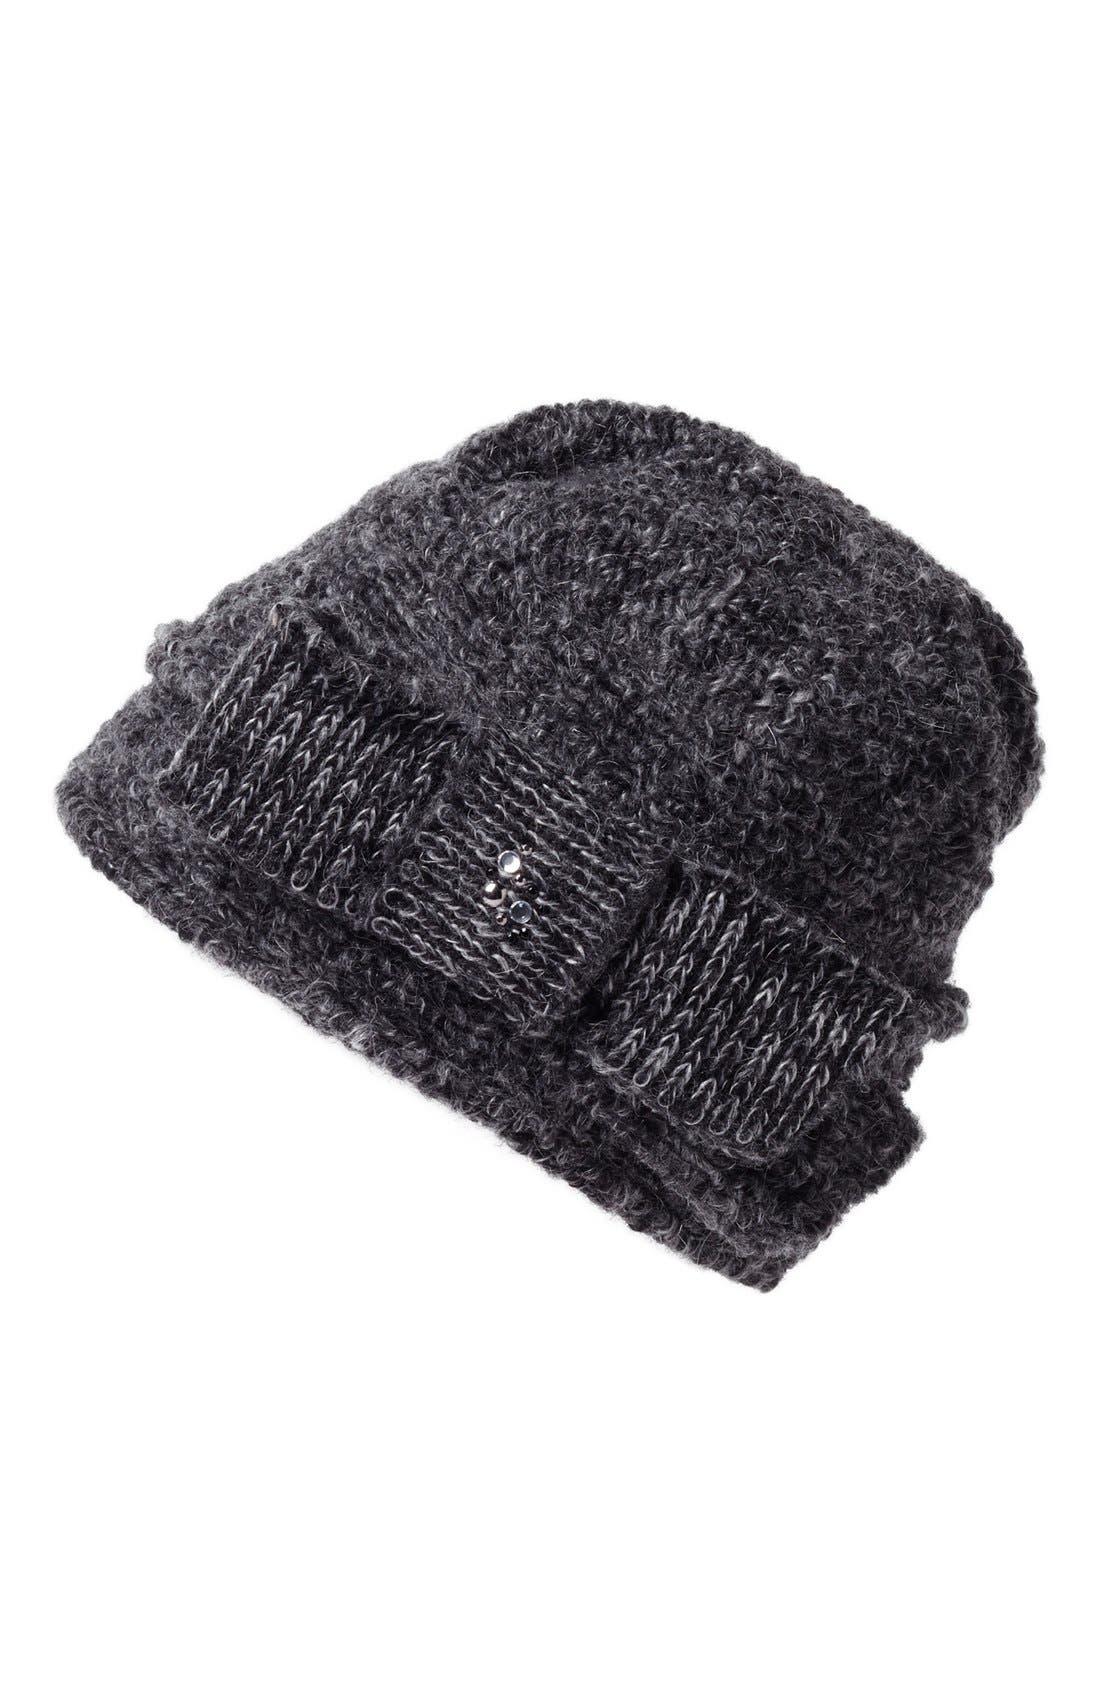 Alternate Image 1 Selected - Tarnish Bouclé Knit Cloche